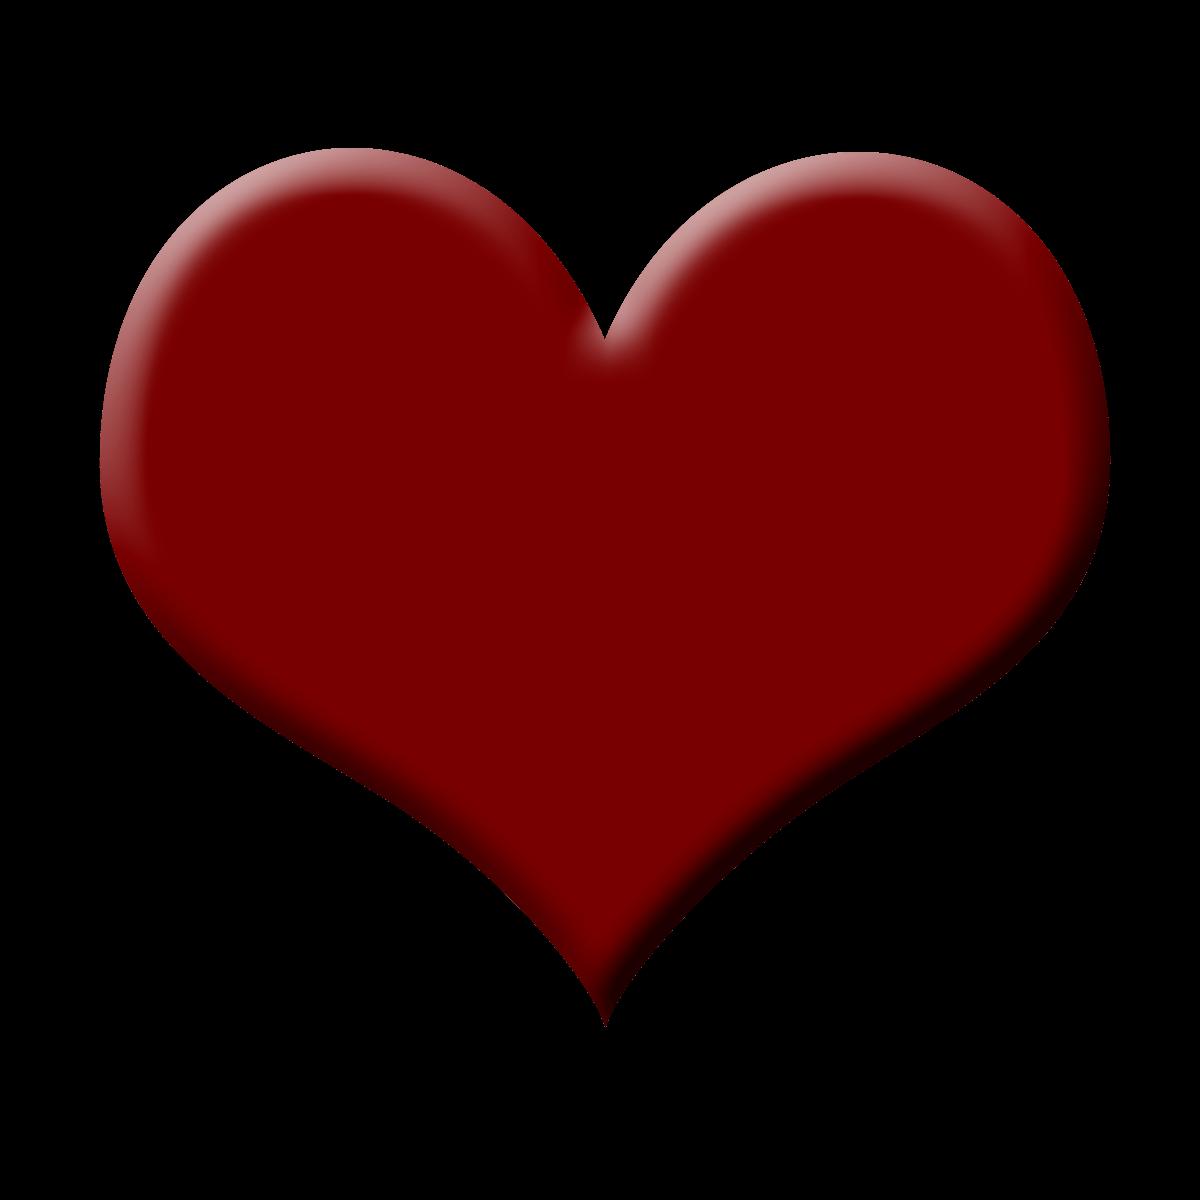 Heart clipart real clip art stock Medical Heart Clipart   Free download best Medical Heart Clipart on ... clip art stock